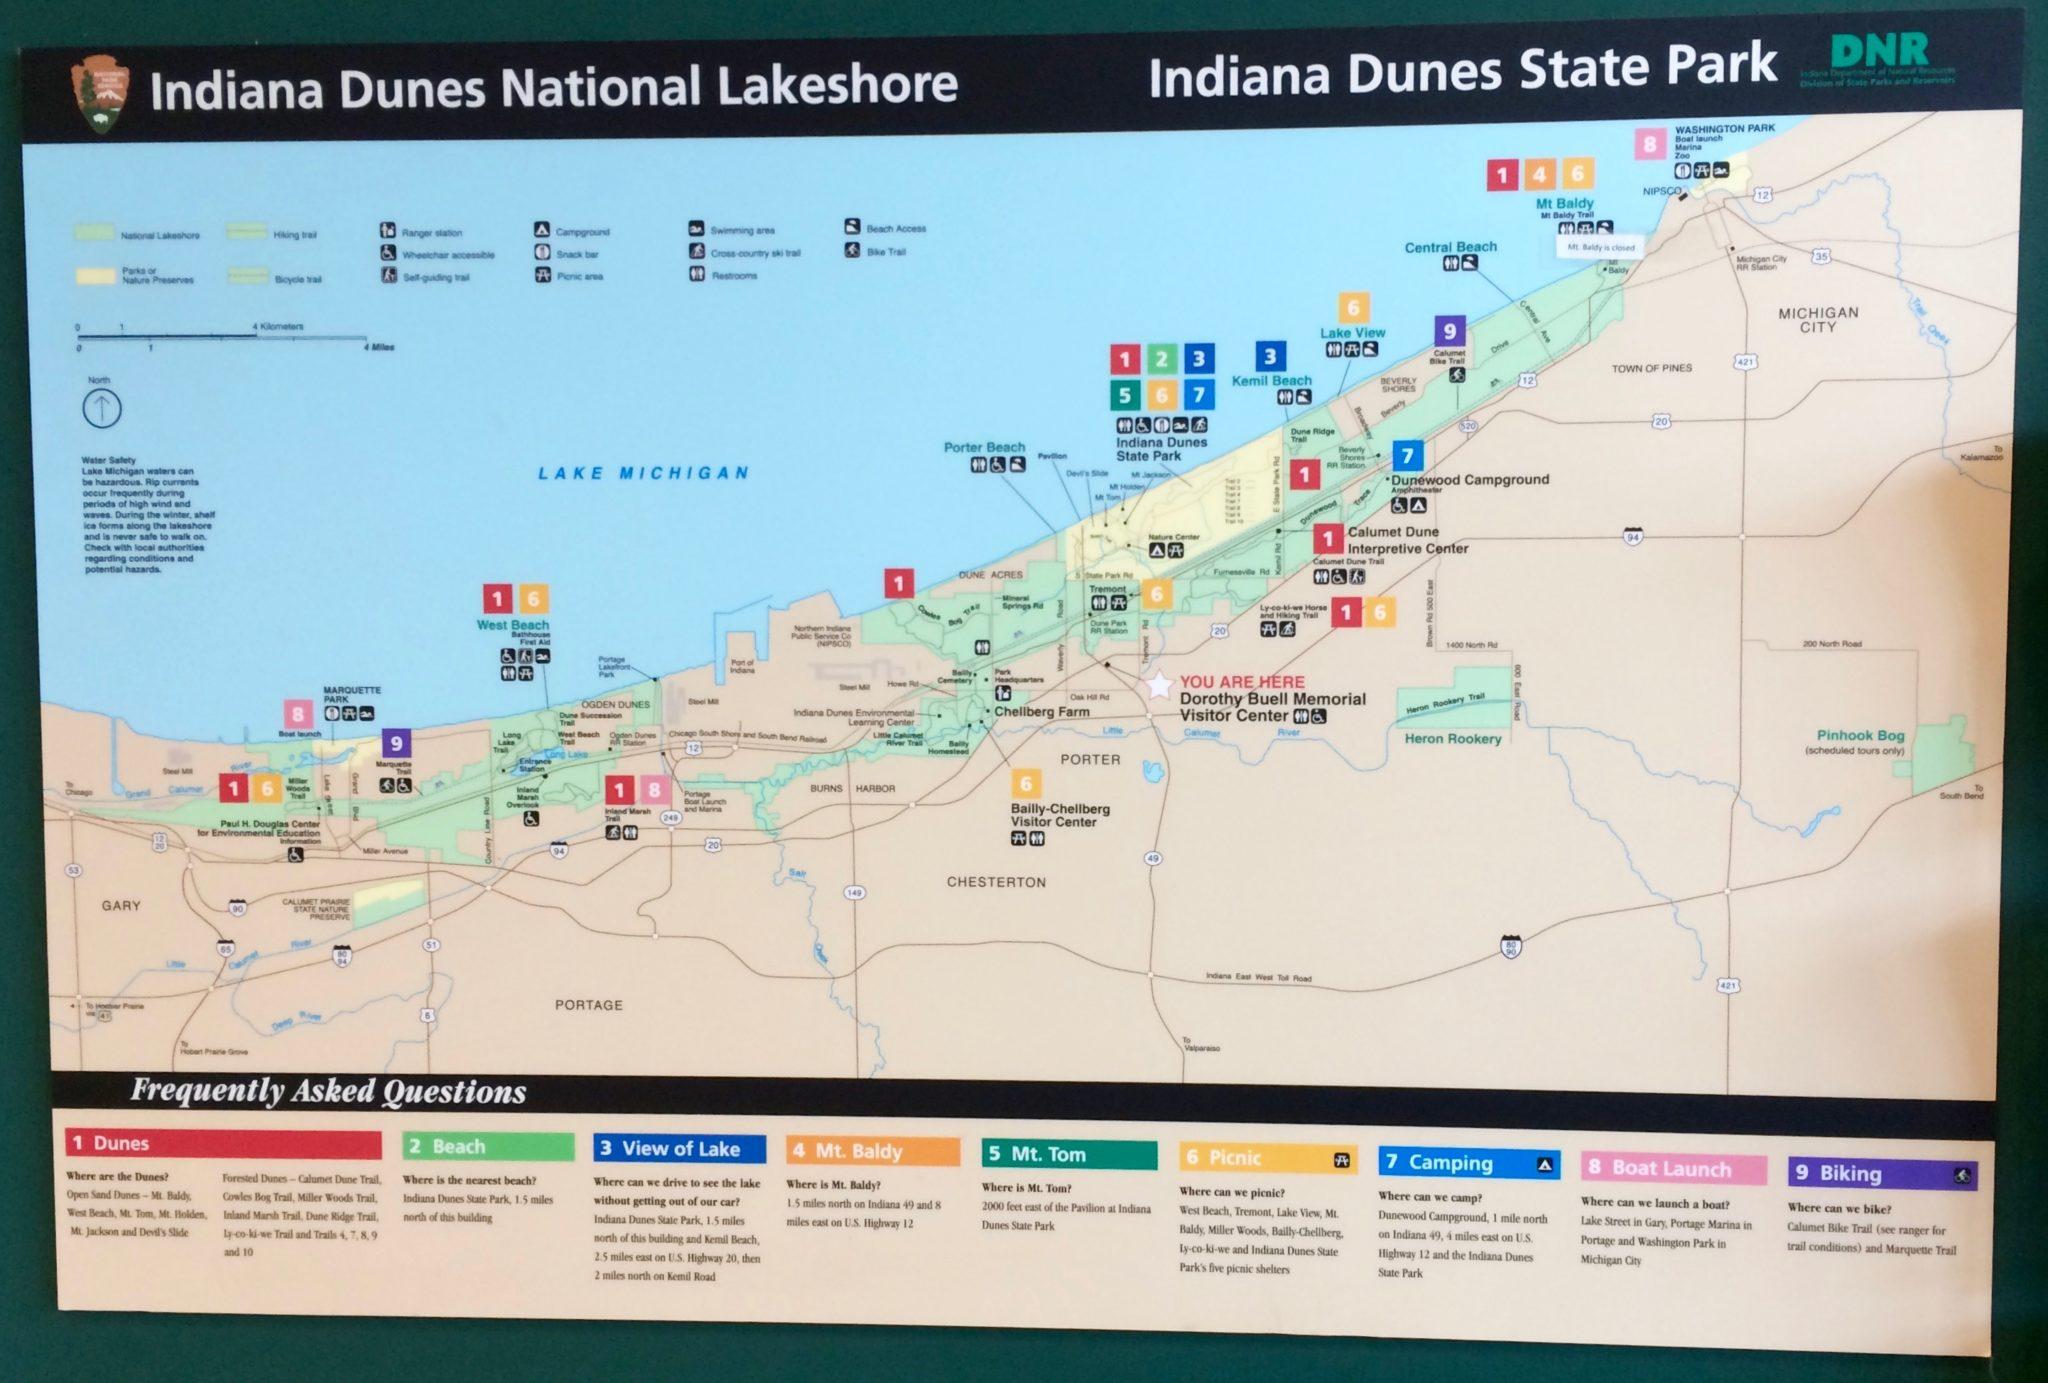 indiana dunes state park - Ecosia